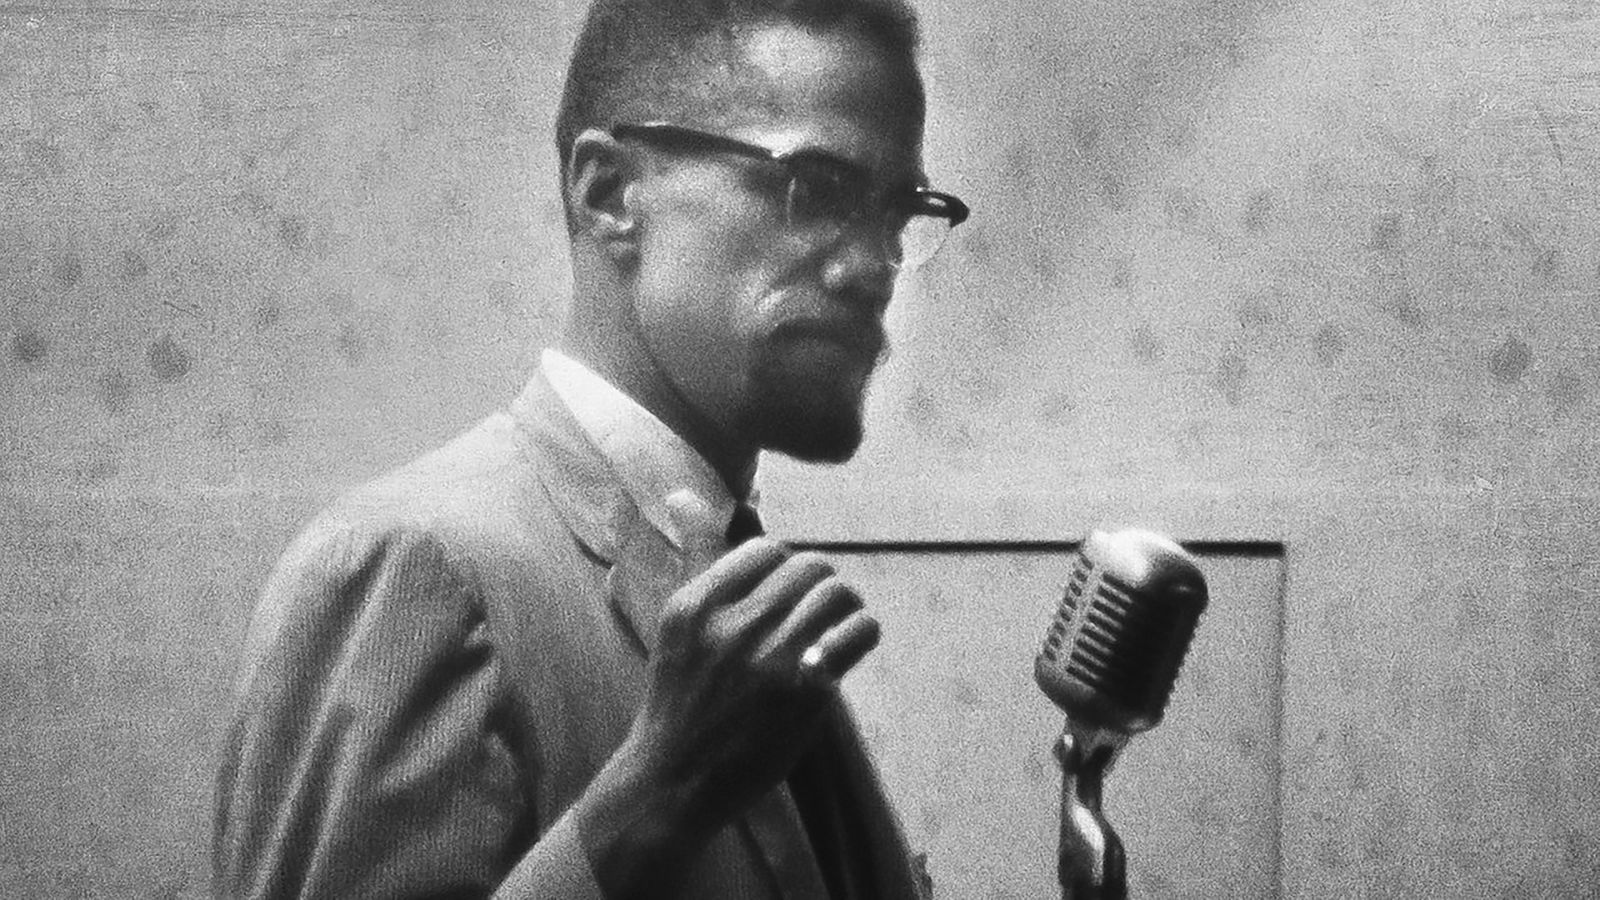 Serien/ Wer hat Malcolm X umgebracht?